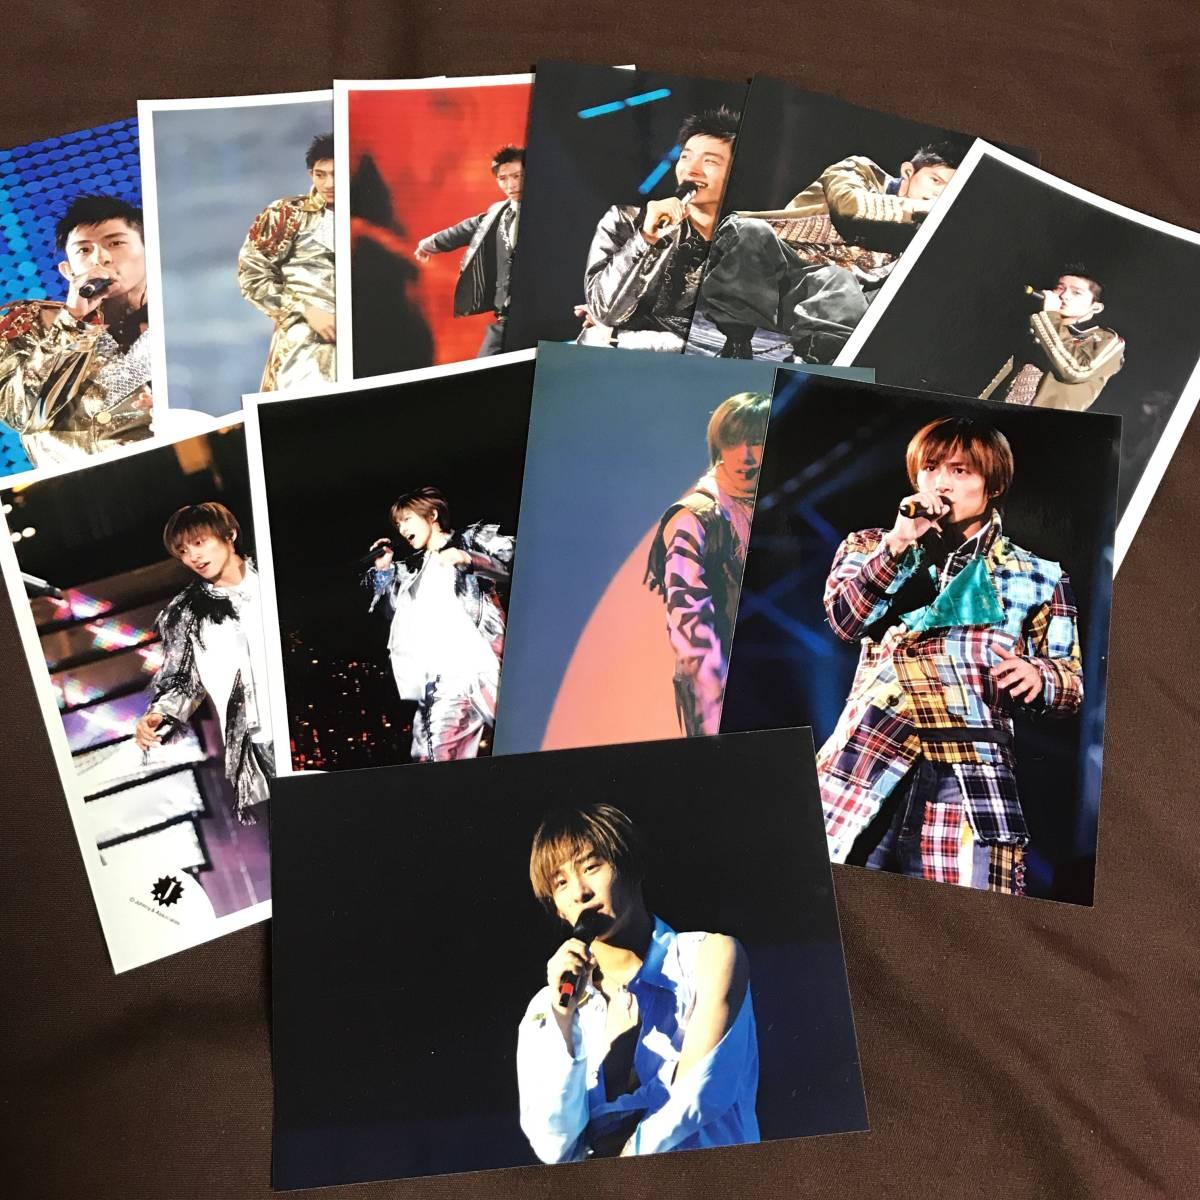 V6 三宅健 公式写真 写真 ブロマイド グッズ コンサートグッズの画像